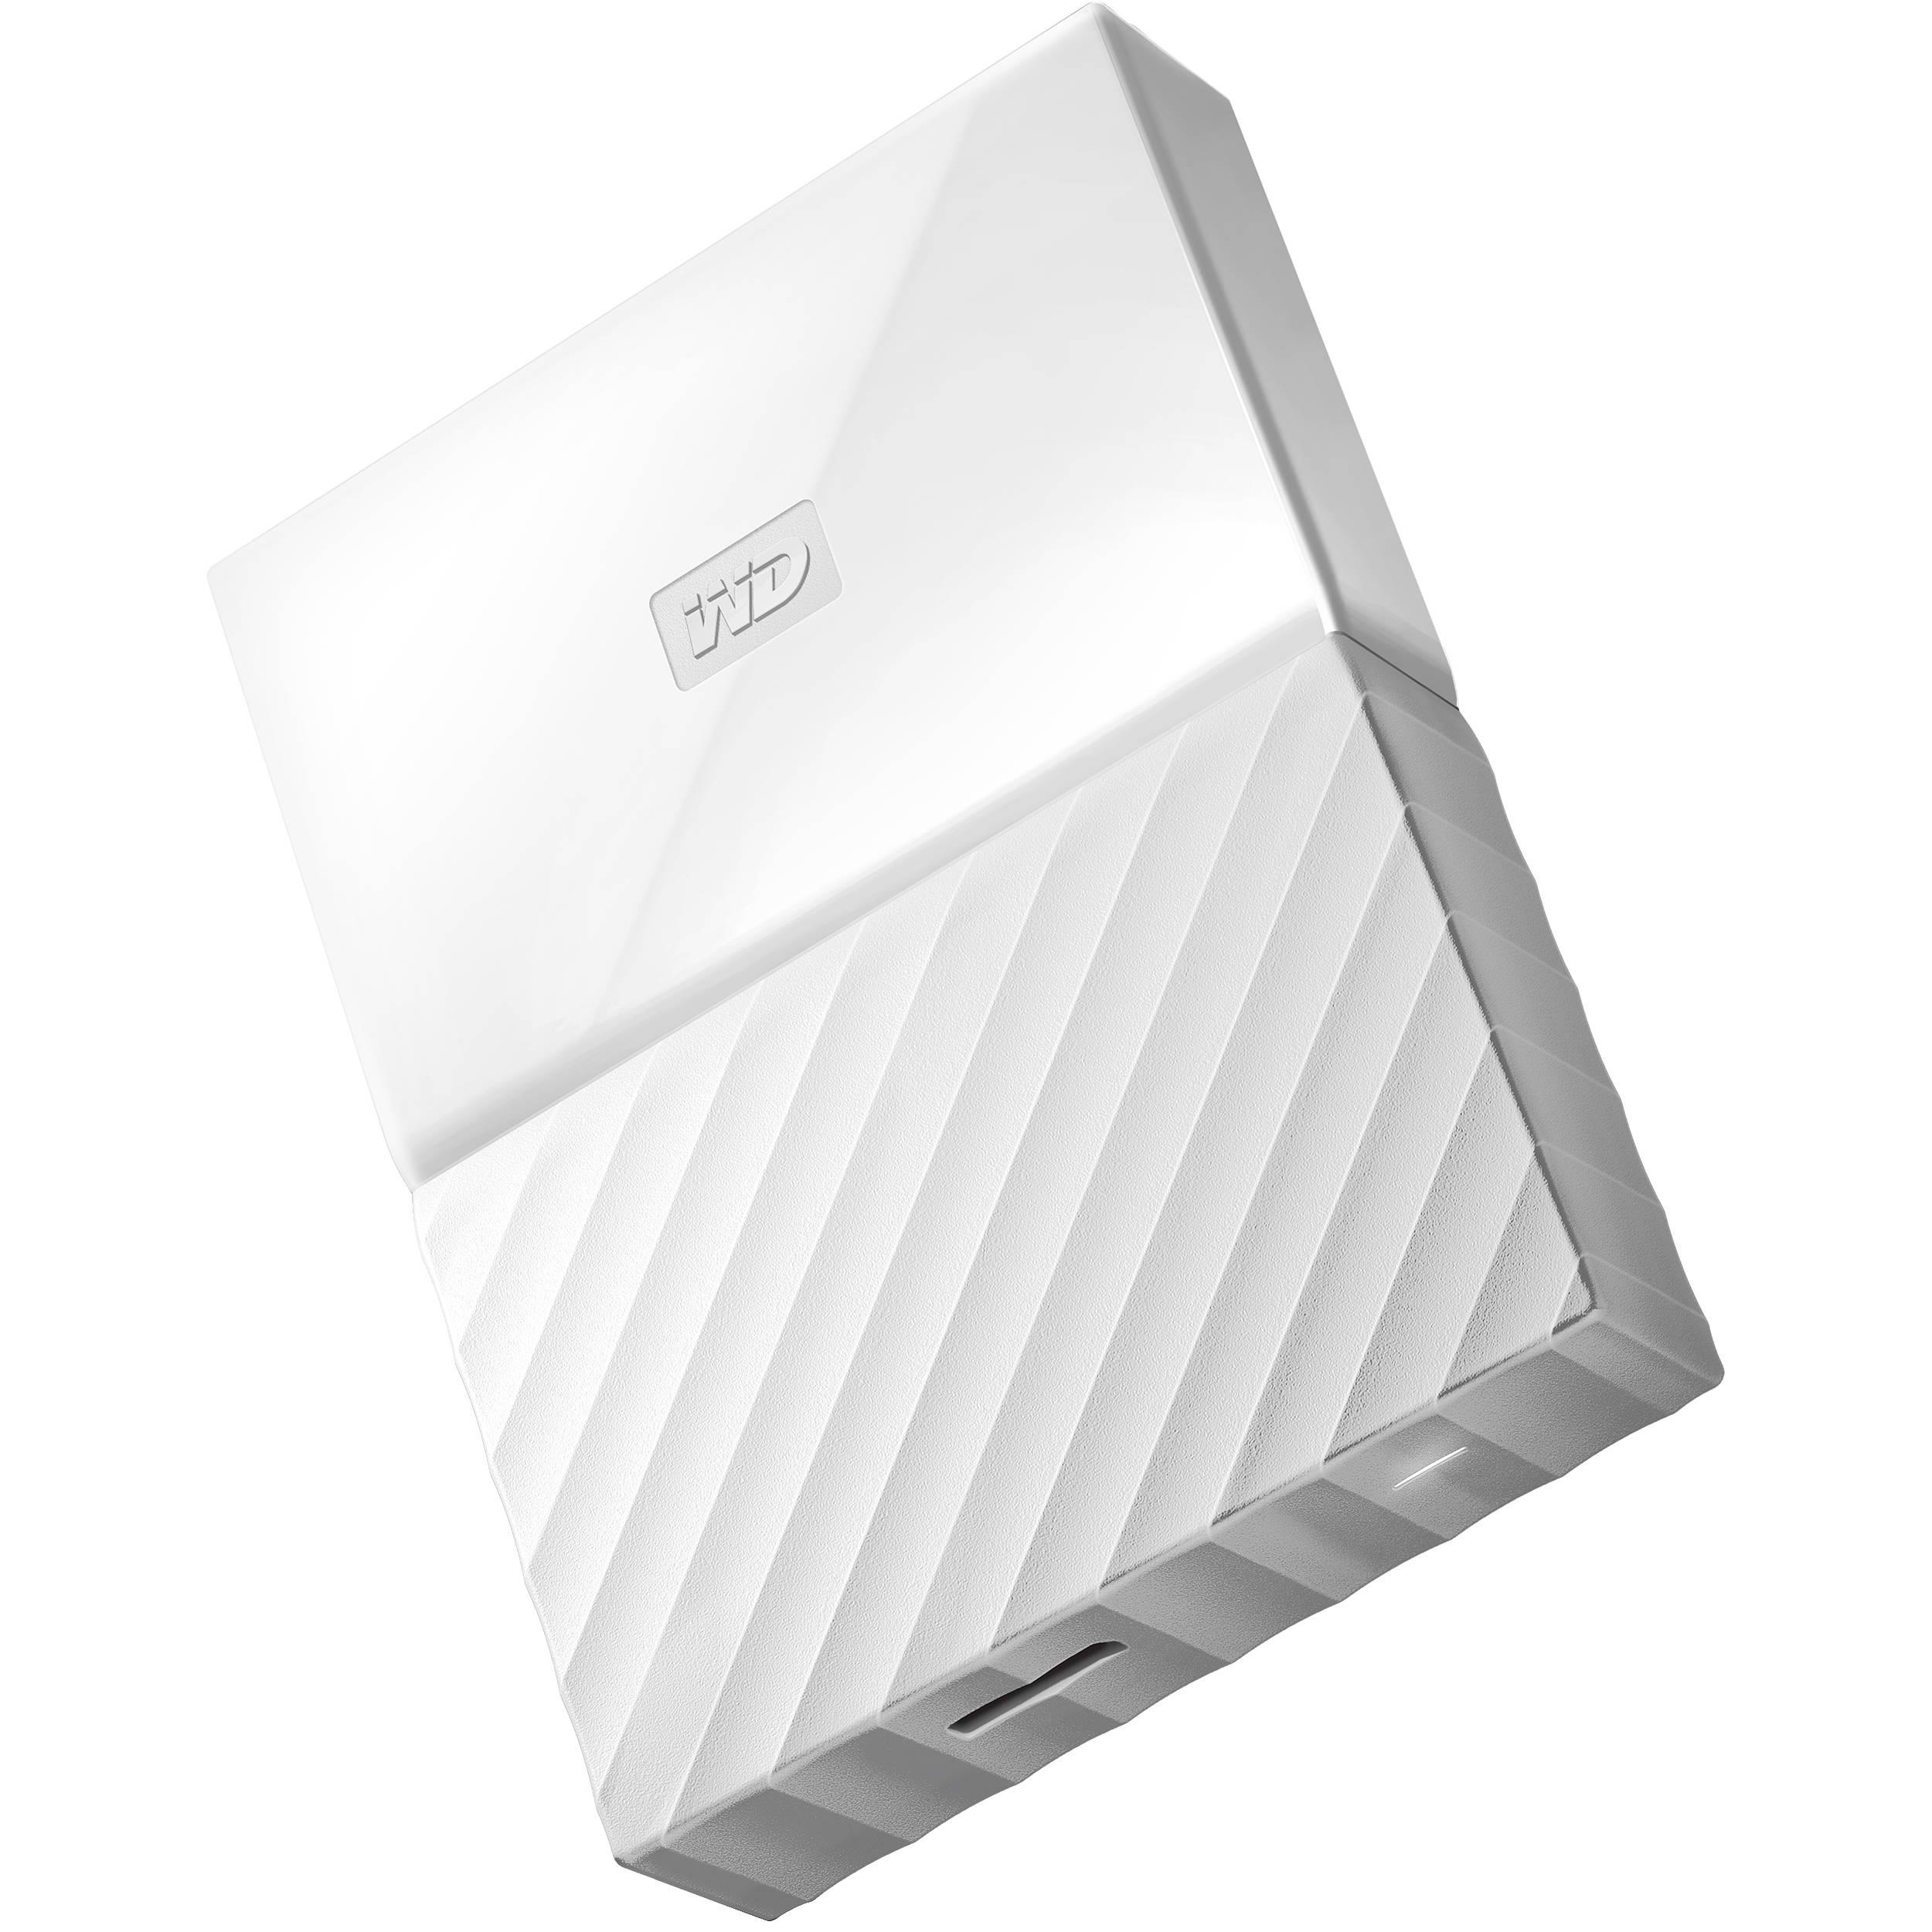 2TB My Passport USB 3 0 Secure Portable Hard Drive (White)